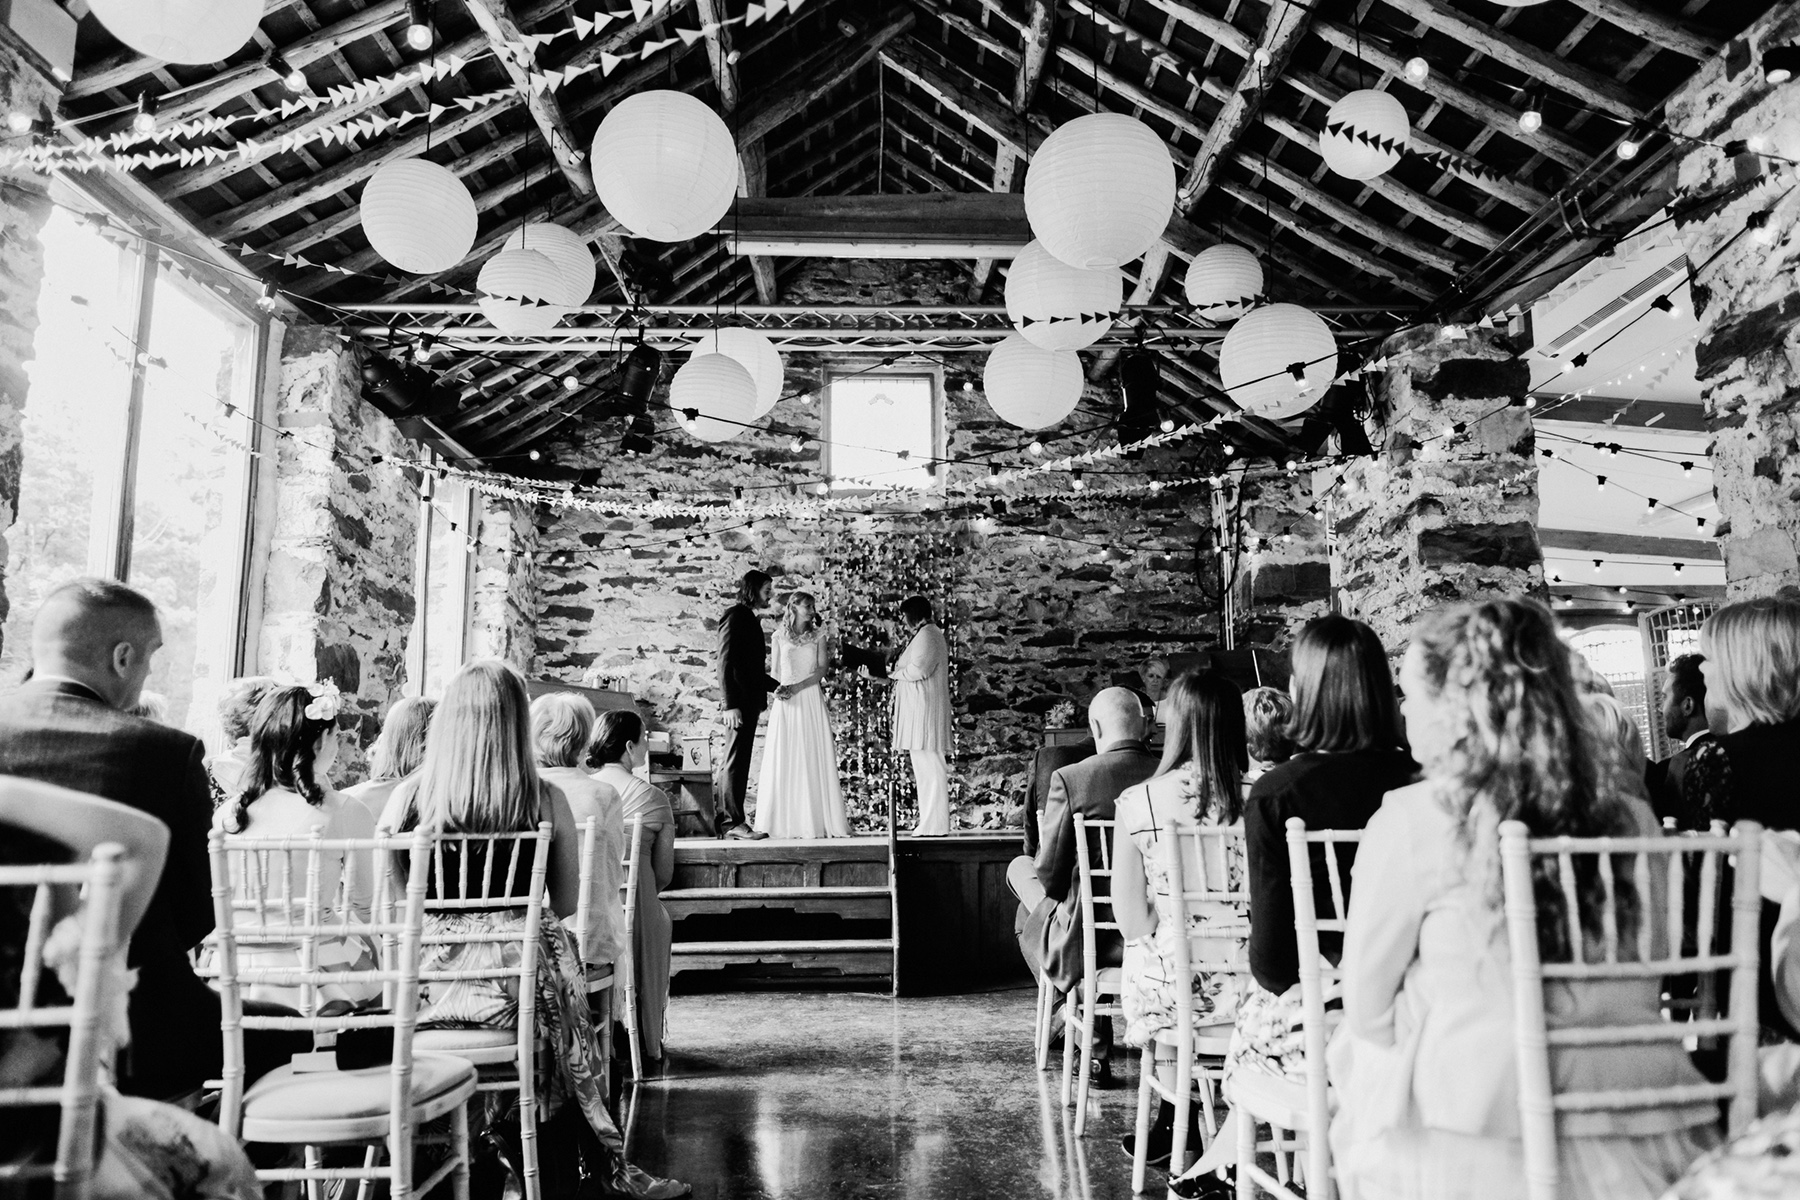 Snowdonia-Wales-Wedding-Photos-0318.jpg